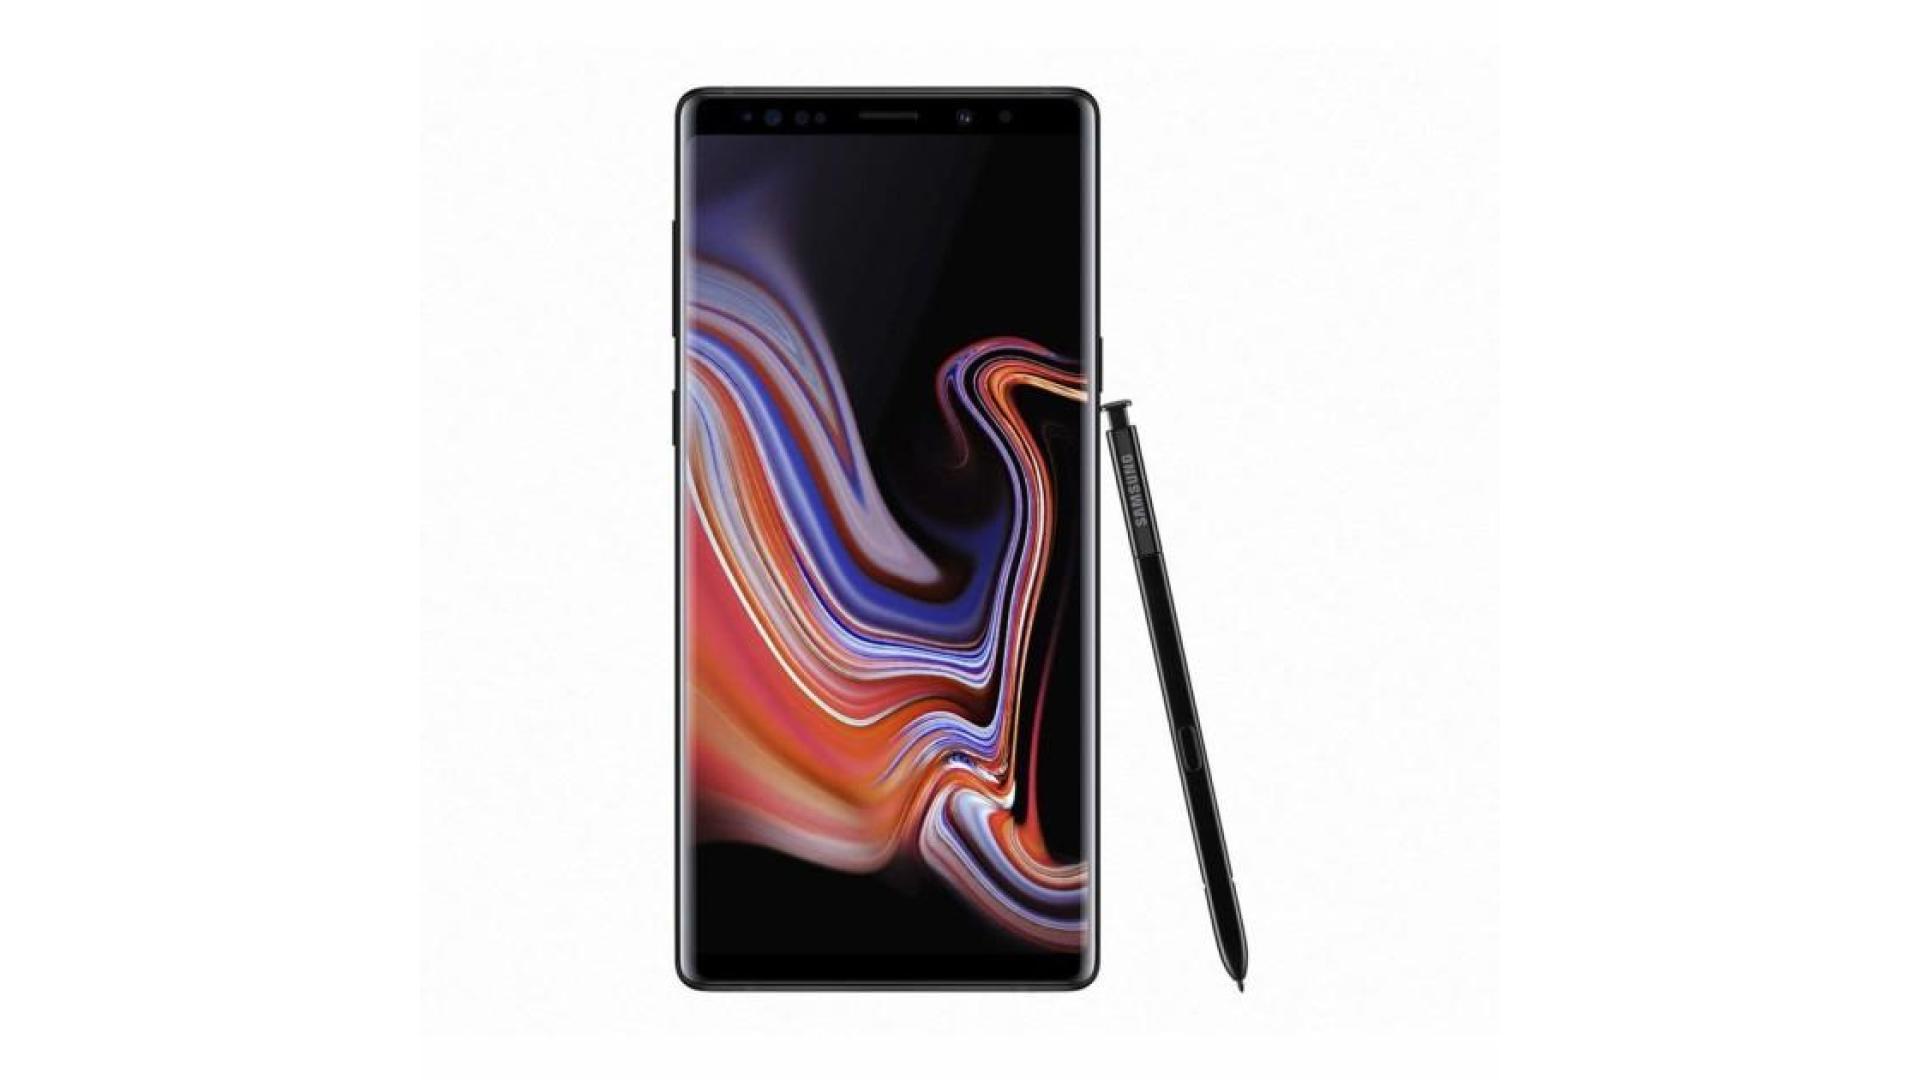 Où acheter le Samsung Galaxy Note 9 au meilleur prix en 2021 ?